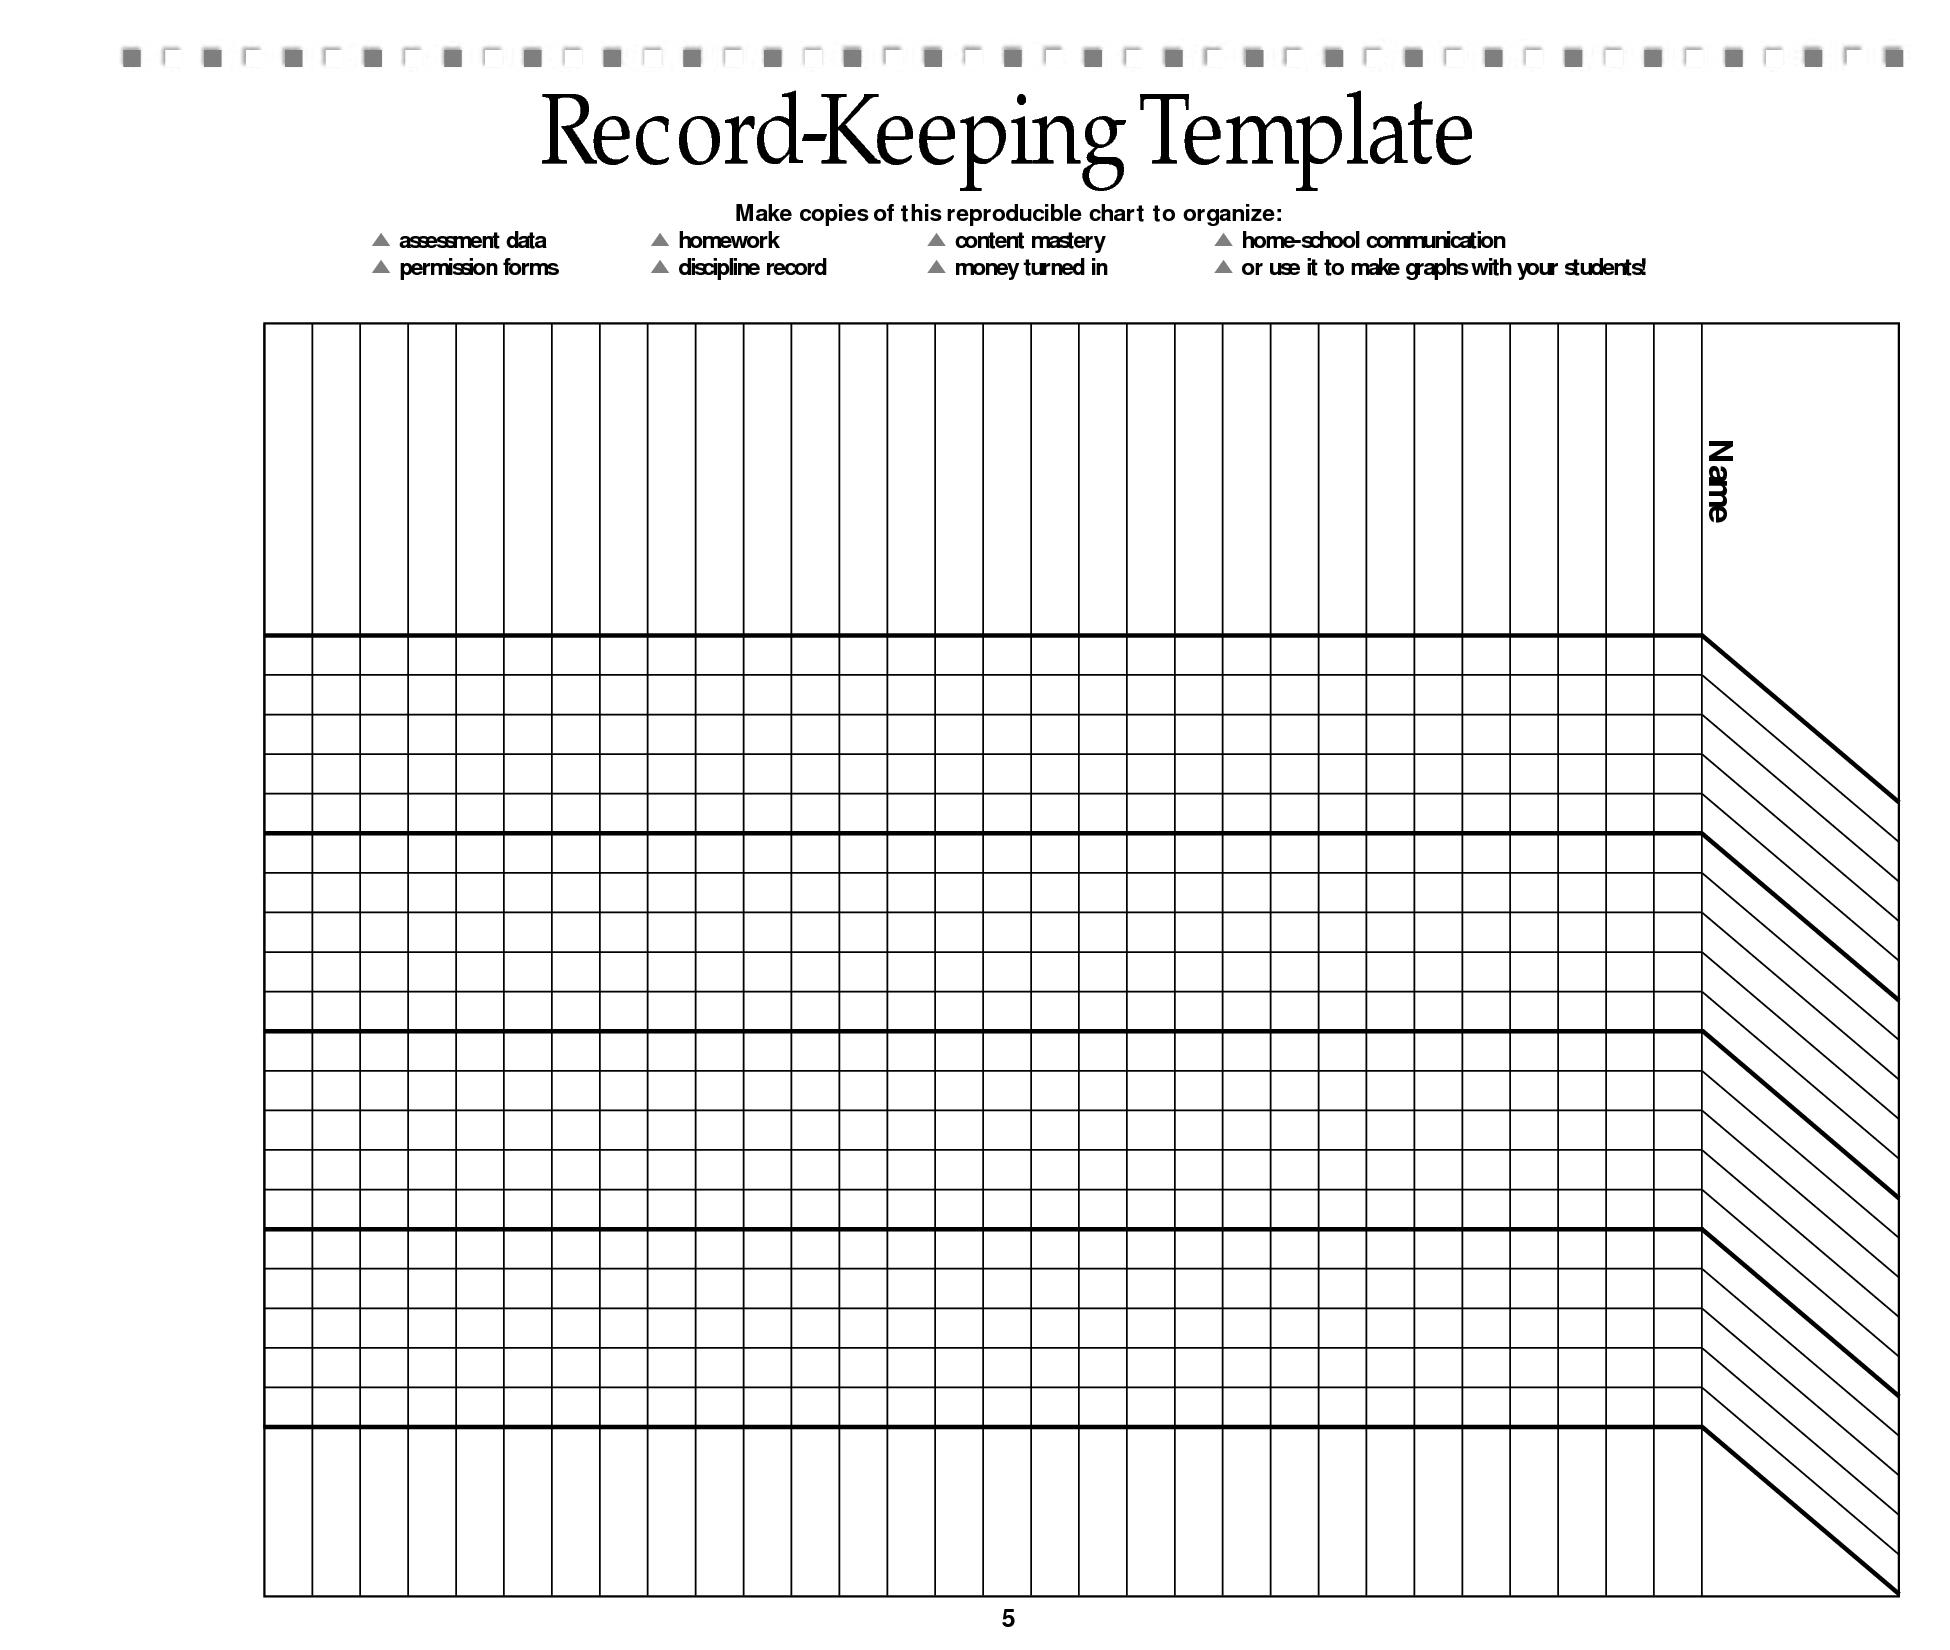 Free Printable Record Keeping Forms | Classroom | Homeschool - Free Printable Attendance Sheets For Homeschool